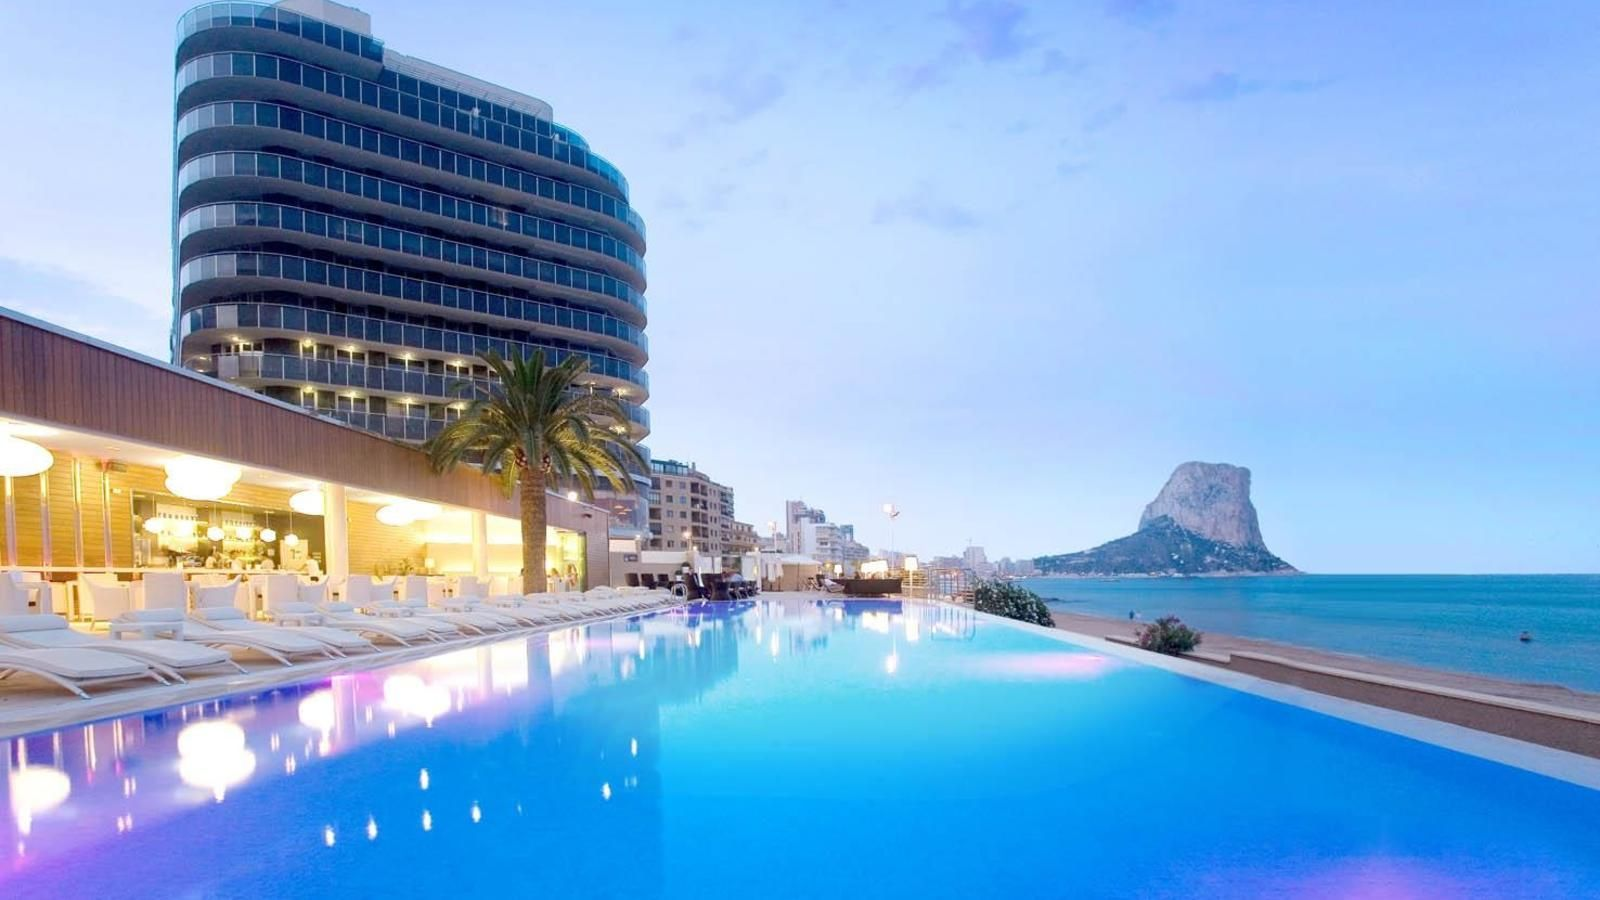 Marbella barcelona calpe los 10 beach clubs de for Dekor wohnungen